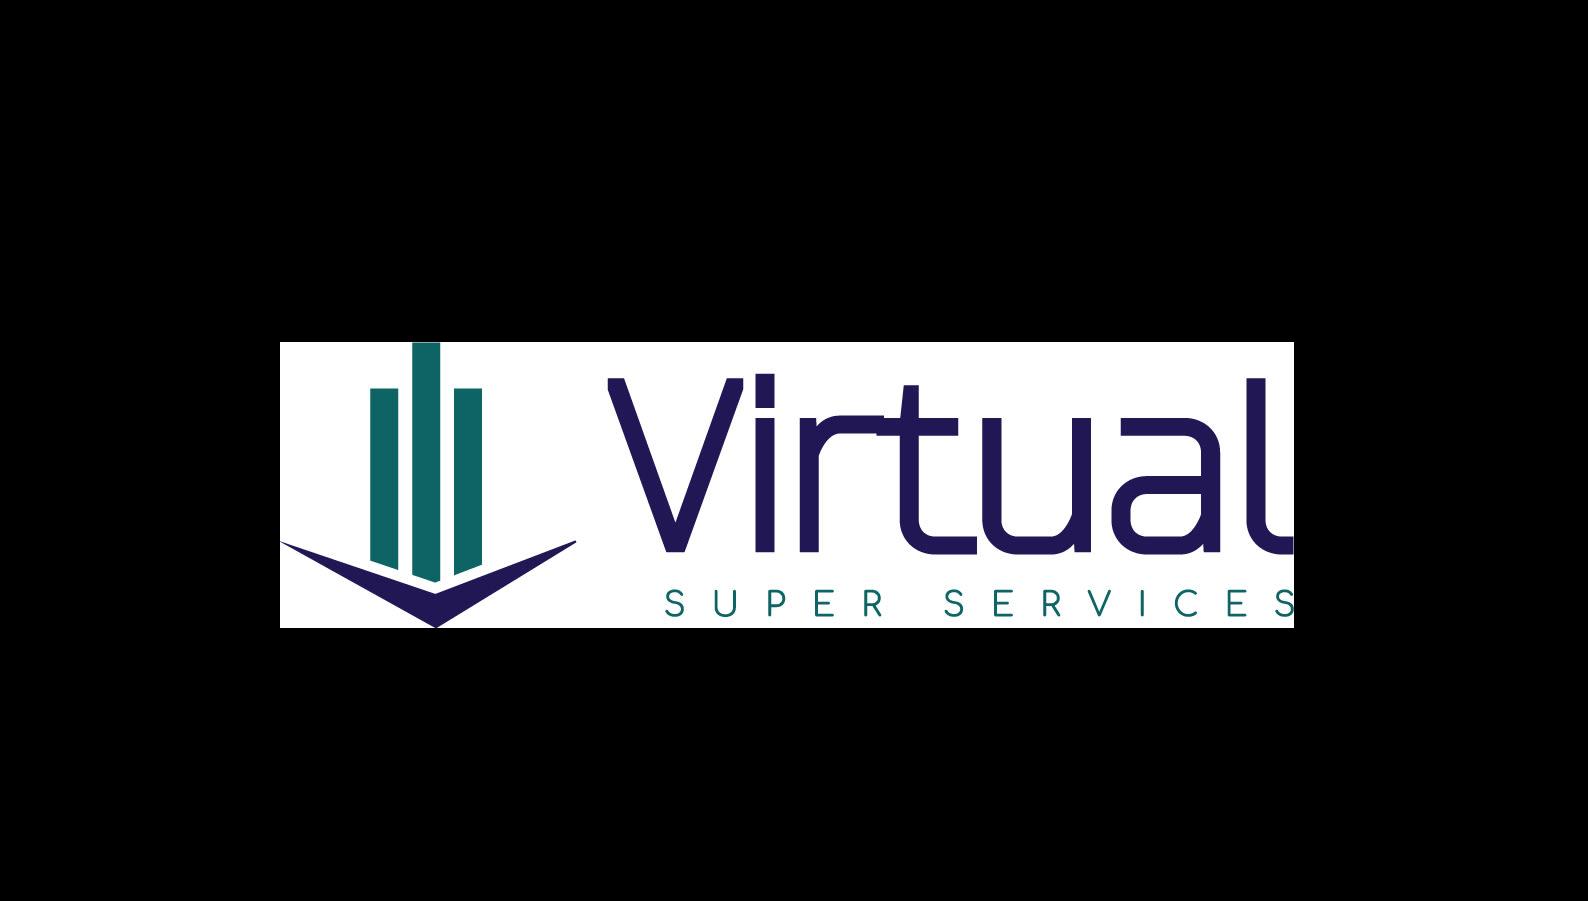 Virtual Super Services